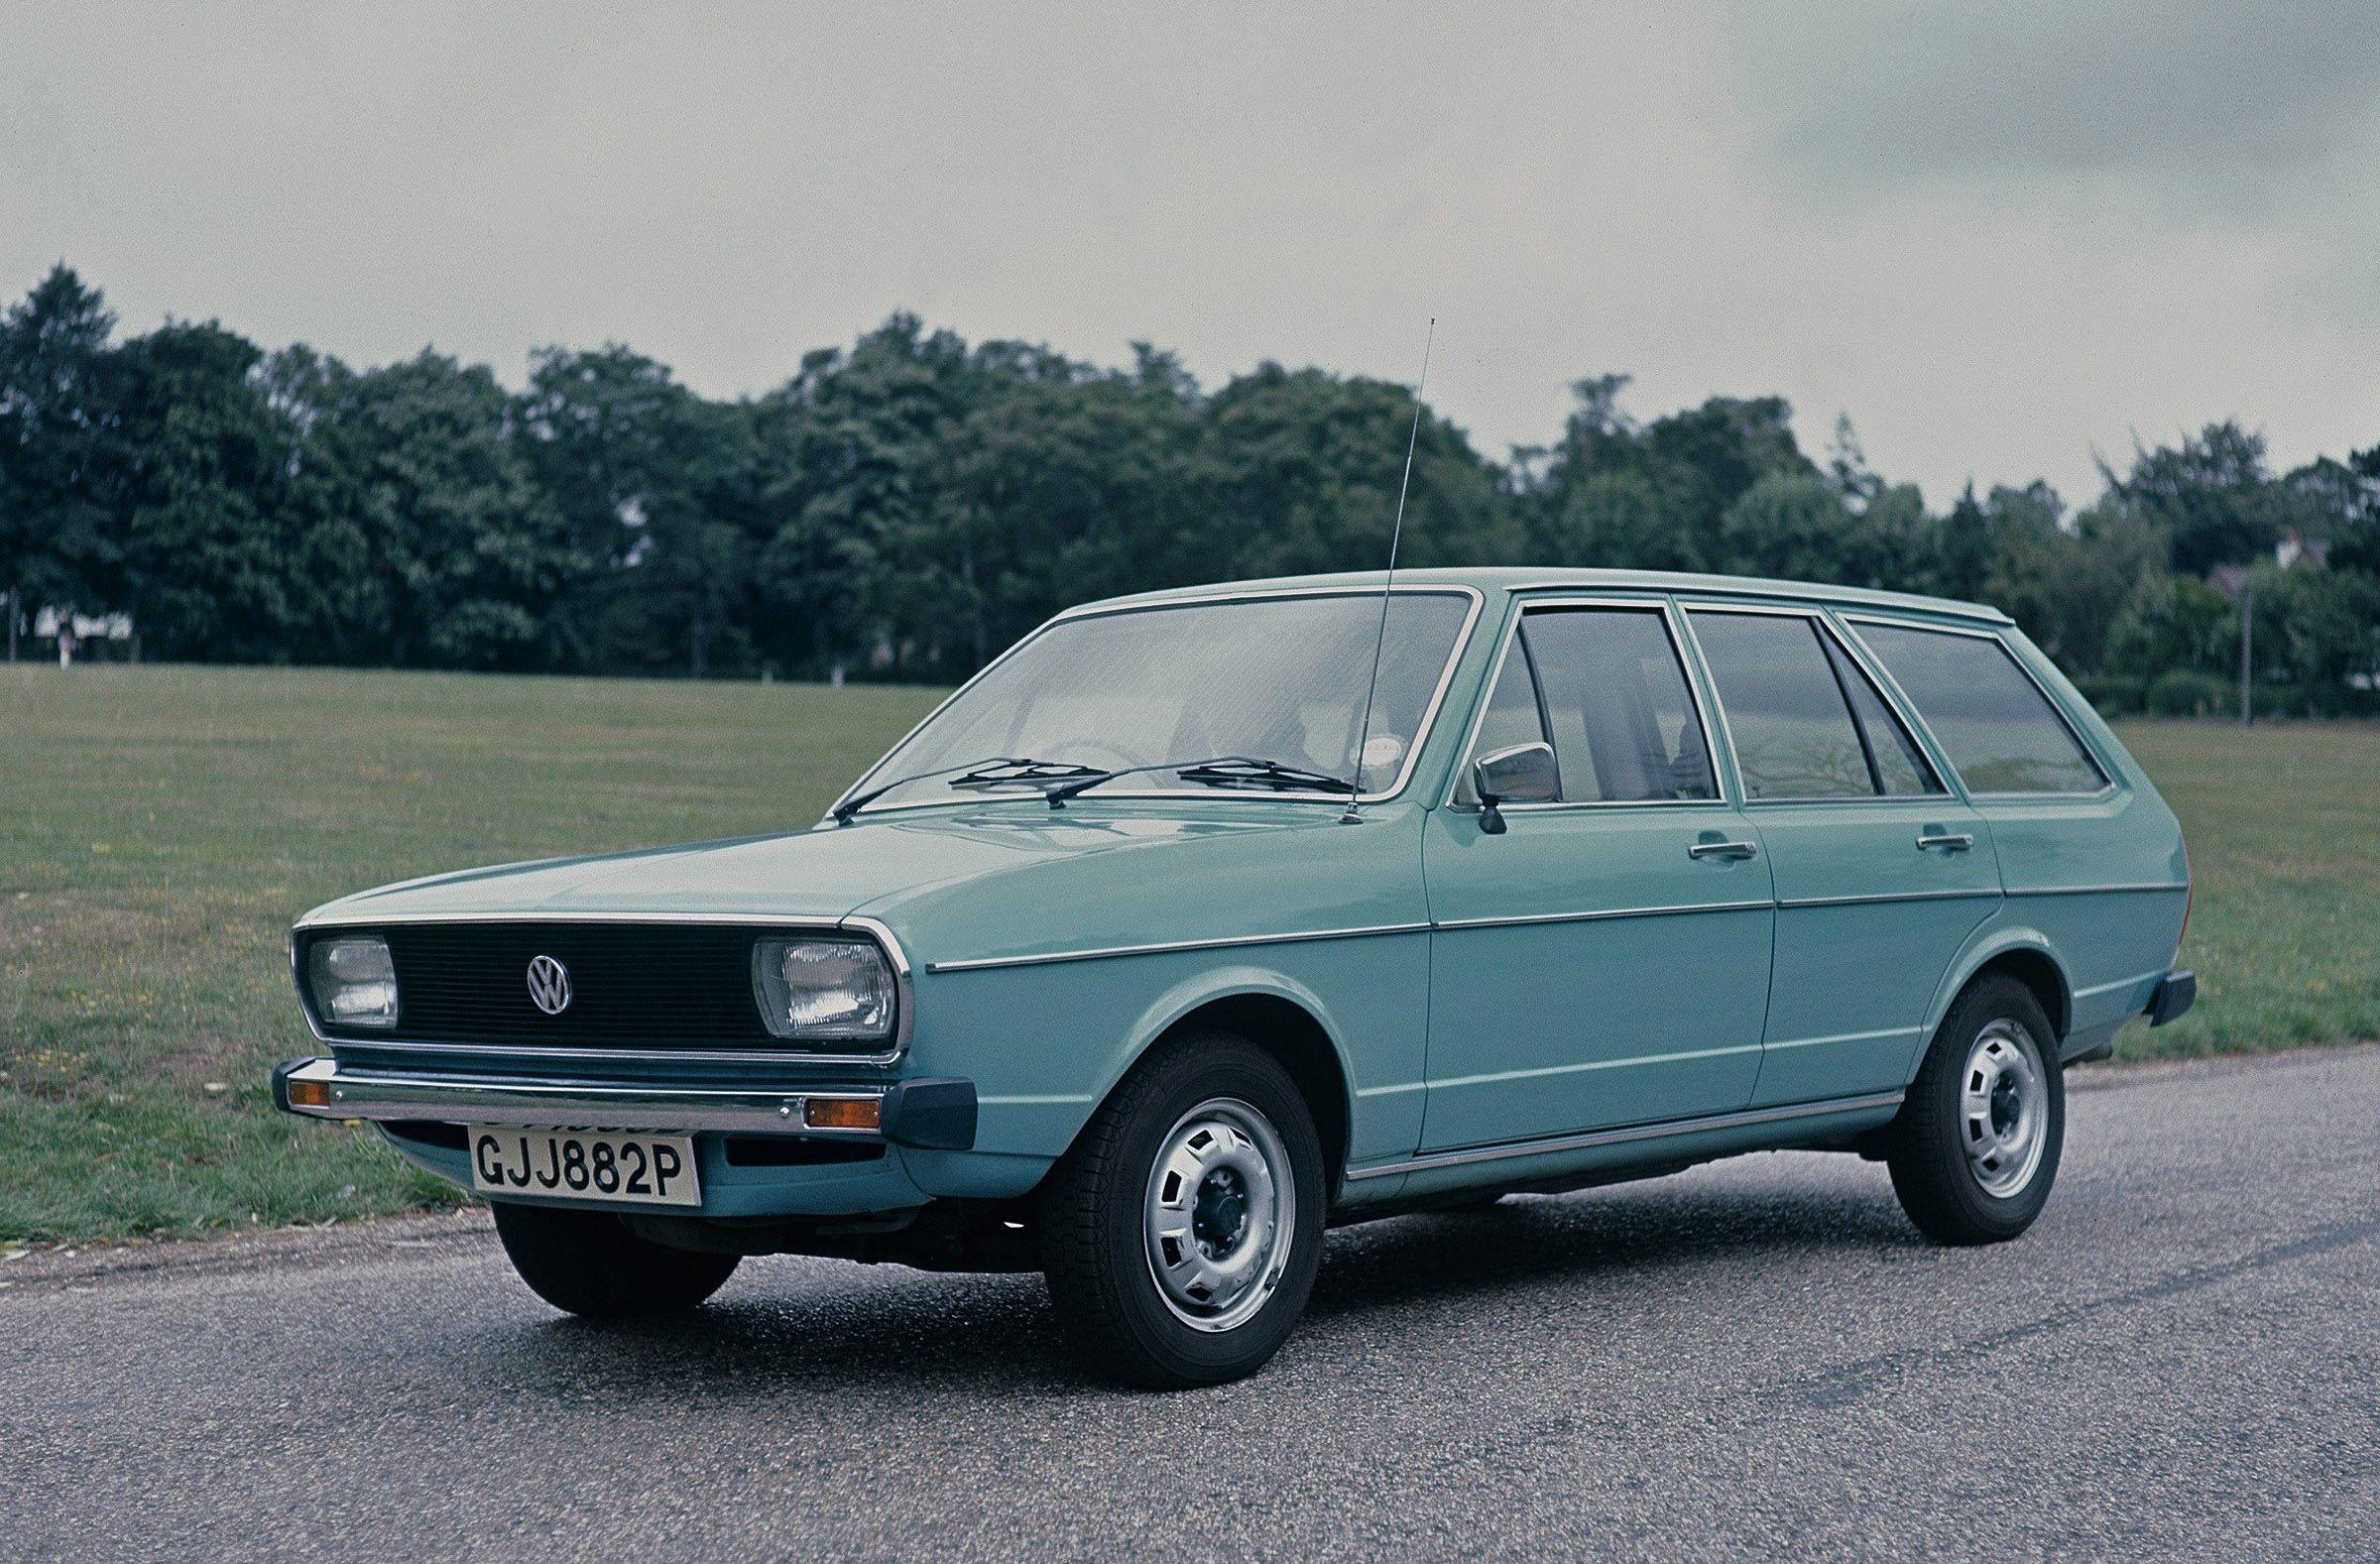 vw passat wagon 1974 cars pics volkswagen pinterest. Black Bedroom Furniture Sets. Home Design Ideas